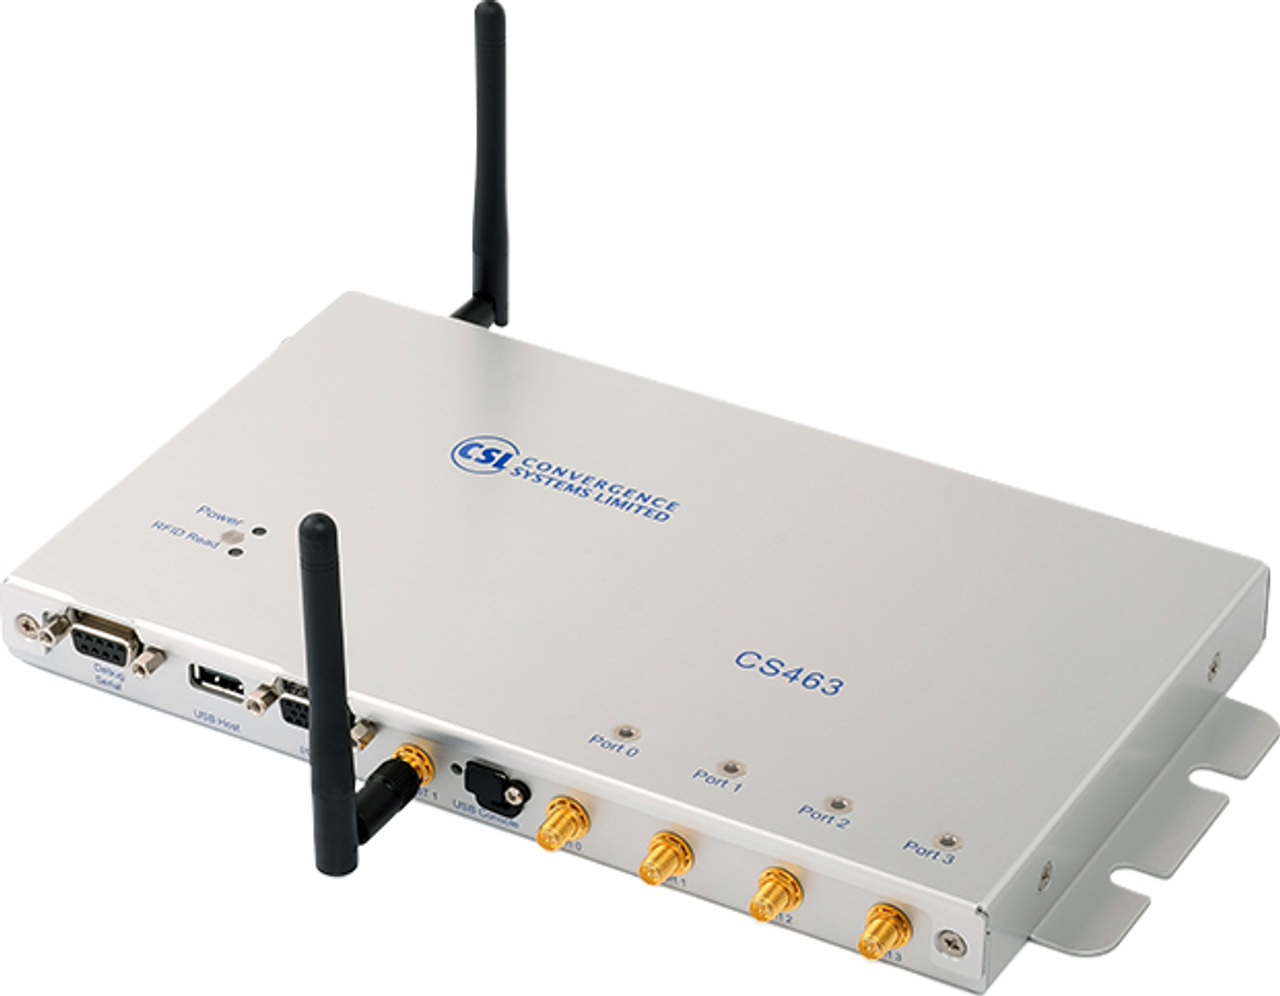 CSL CS463 Intelligent Fixed UHF RFID Reader